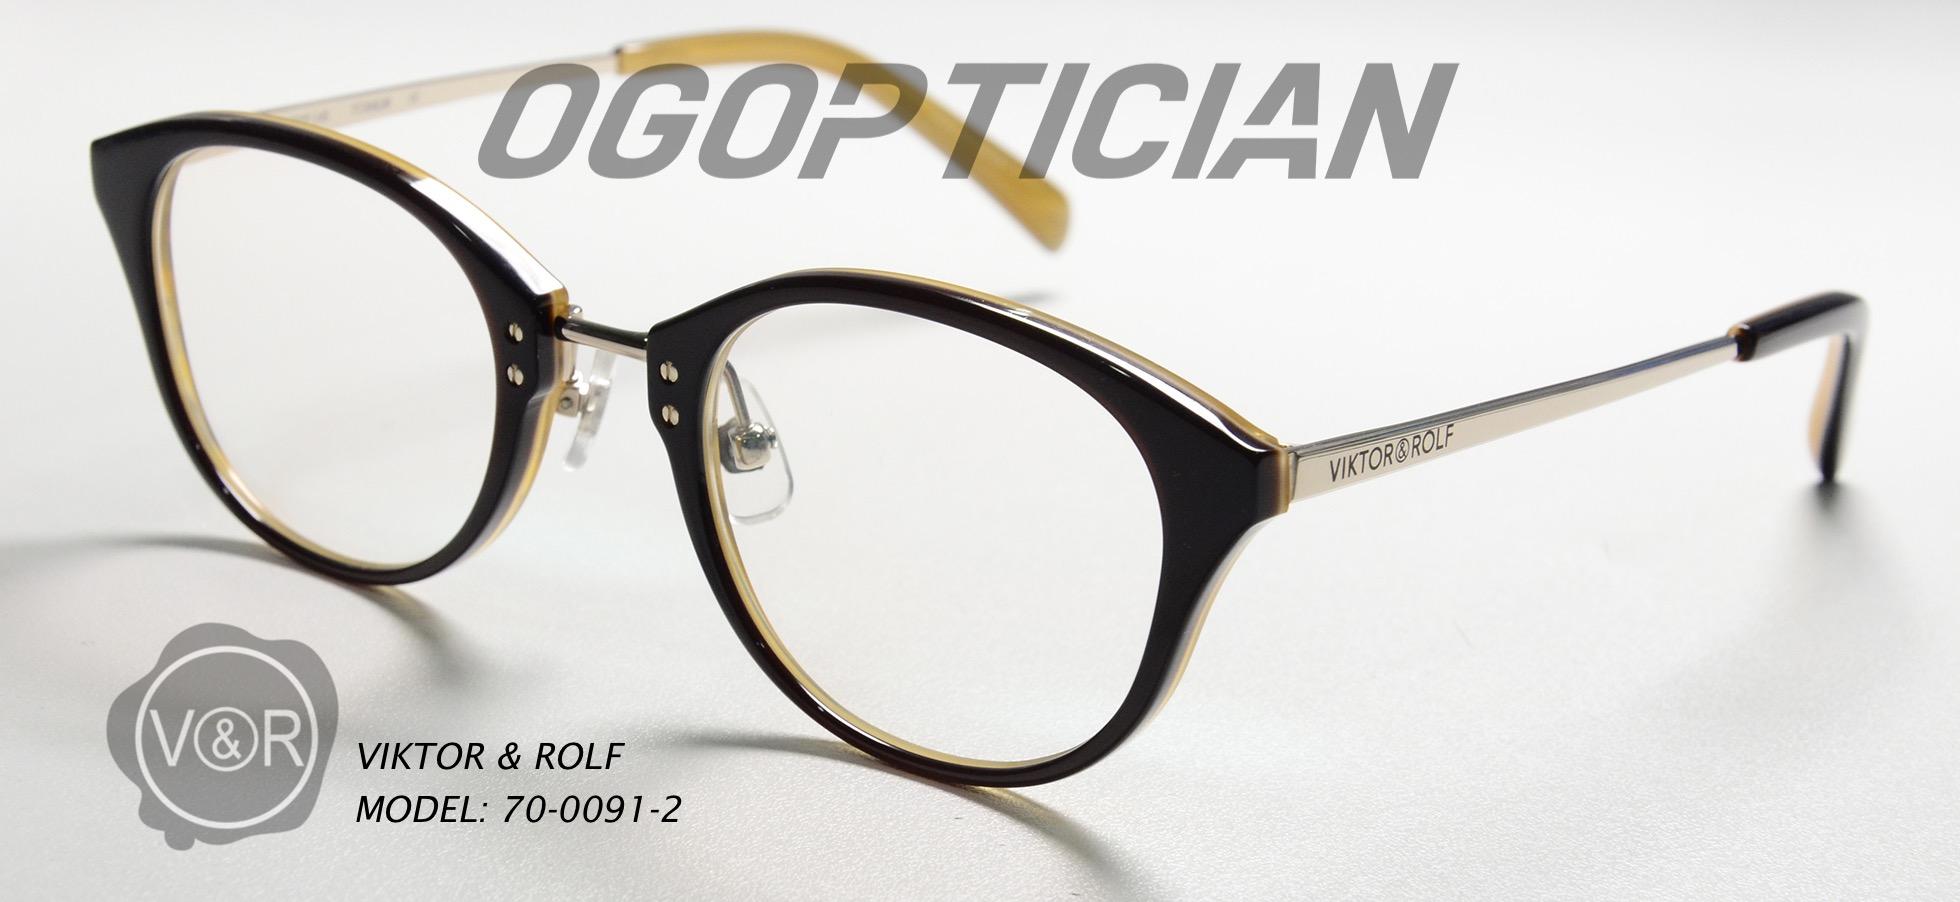 VIKTORANDROLF 70-0091-2